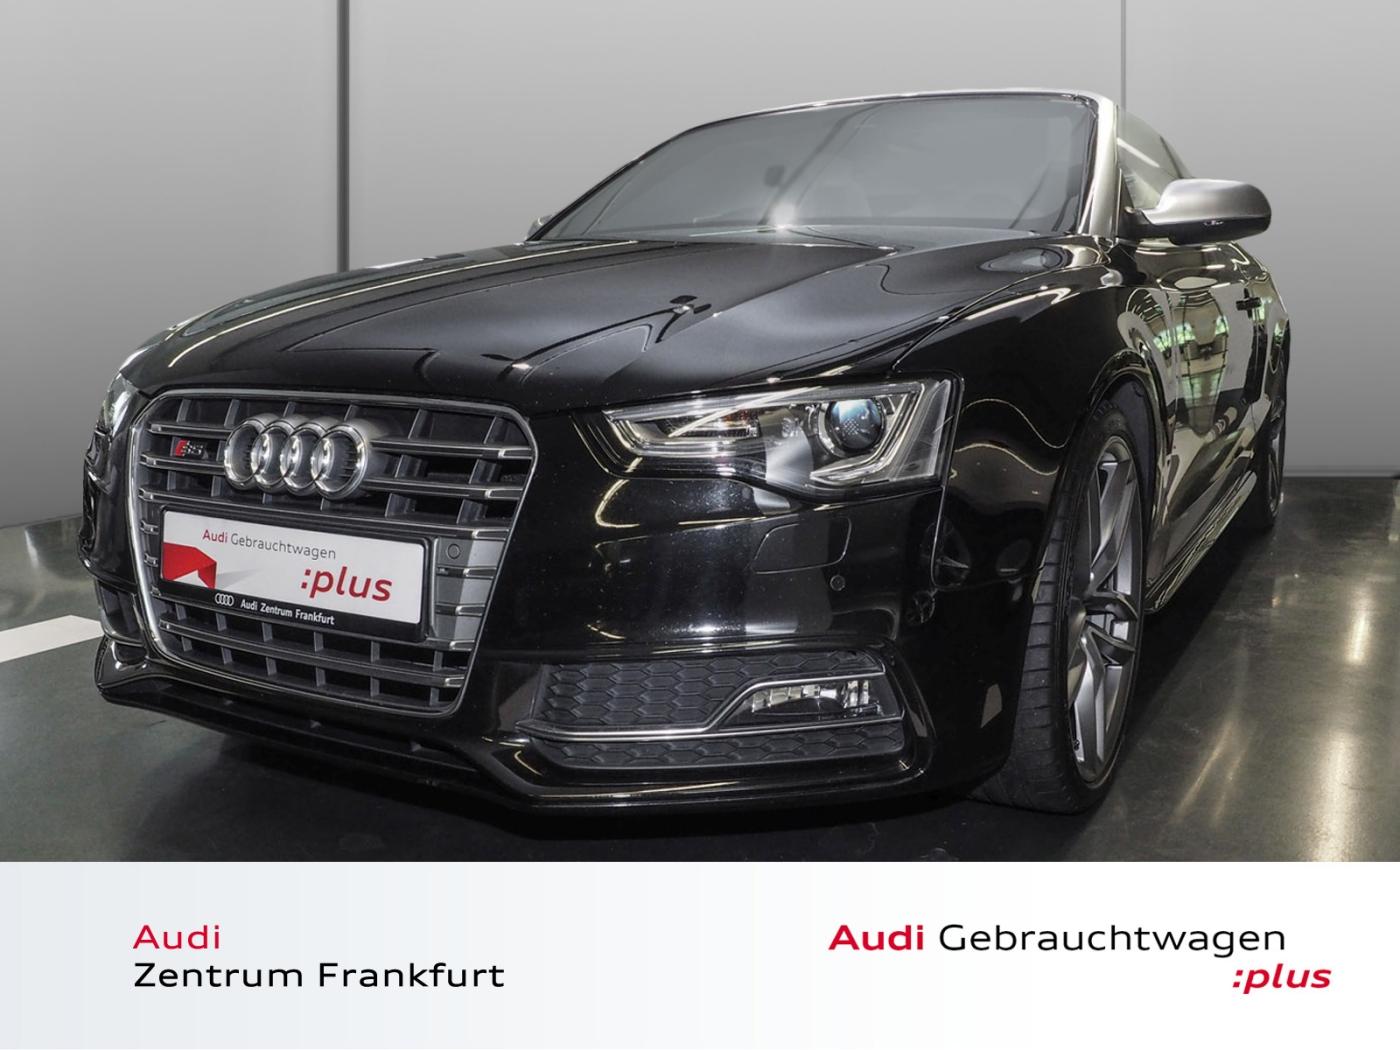 Audi S5 Cabriolet 3.0 TFSI quattro S tronic Navi Xeno, Jahr 2016, Benzin